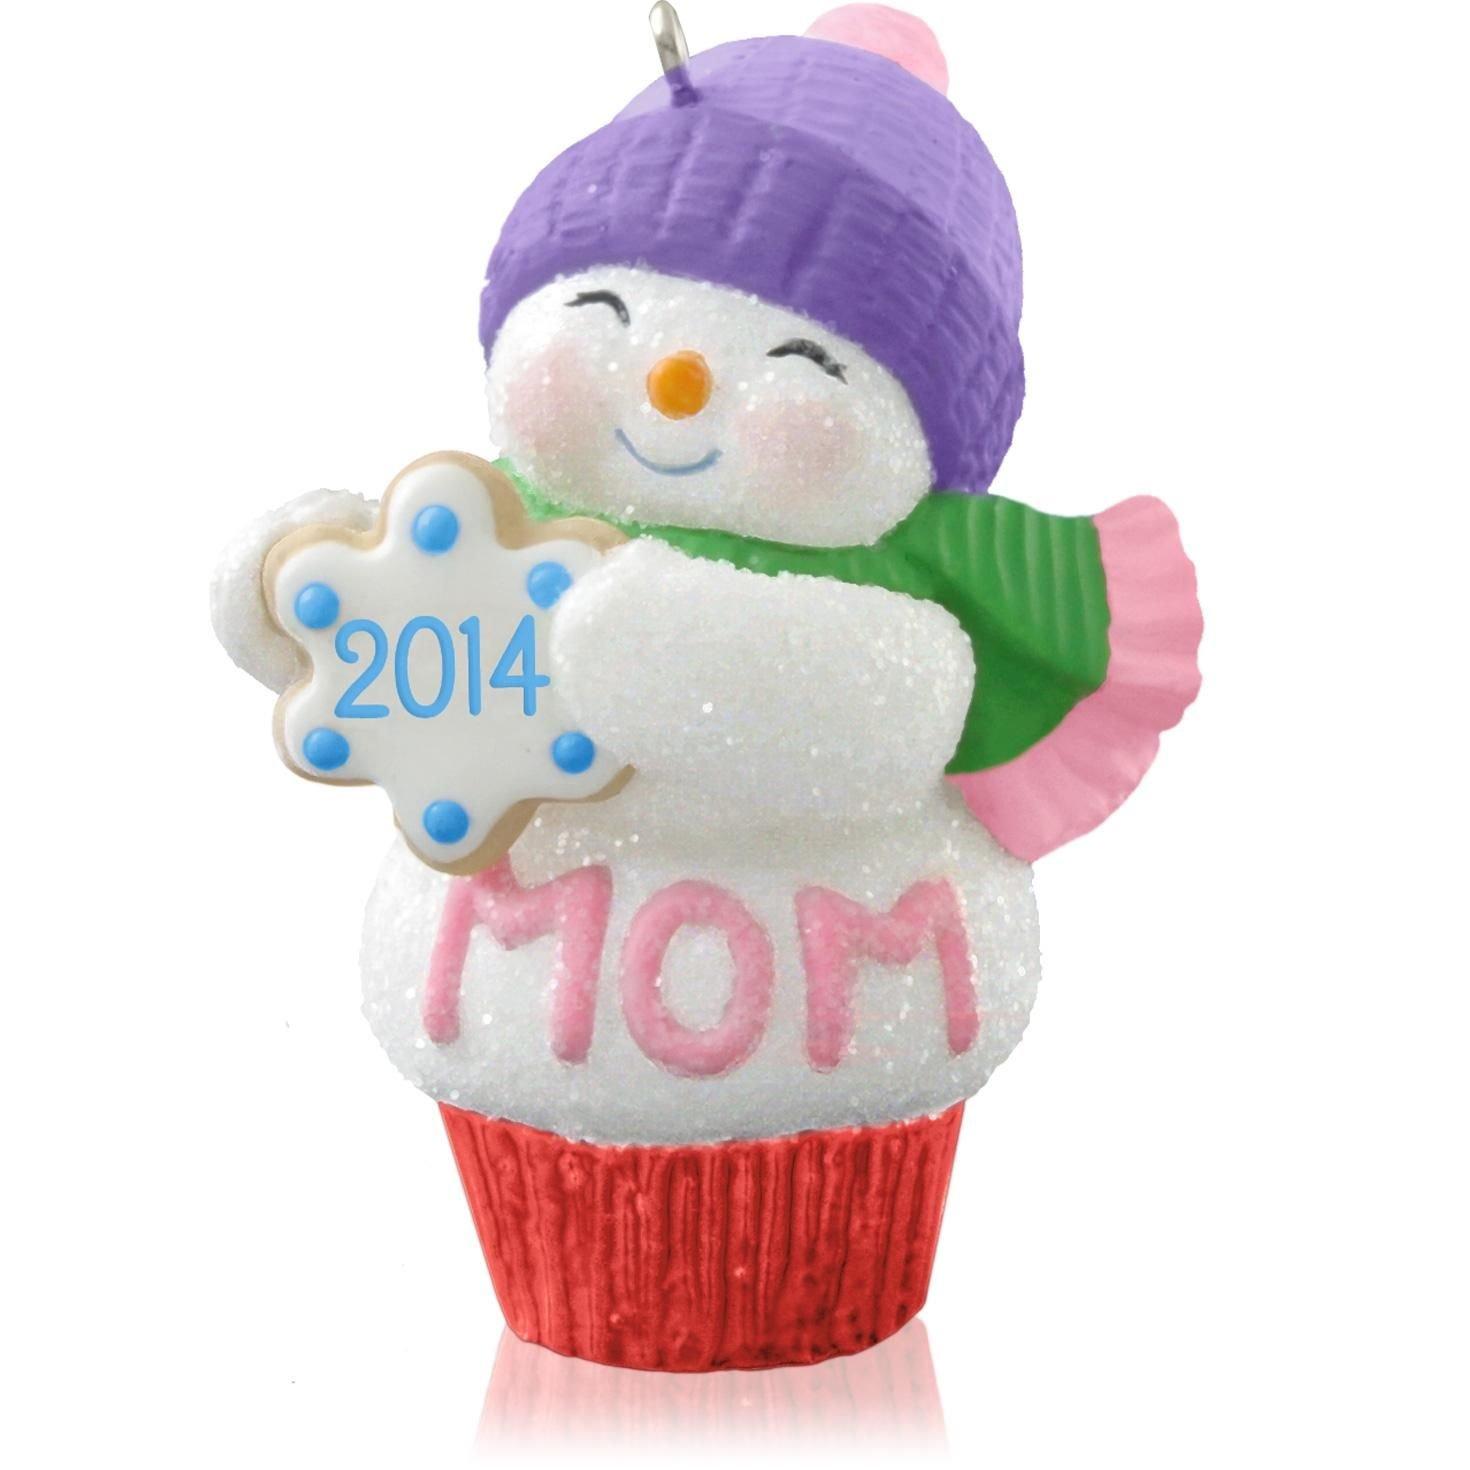 Amazon: Hallmark Qgo1083 Mom  2014 Christmas Keepsake Ornament: Home &  Kitchen